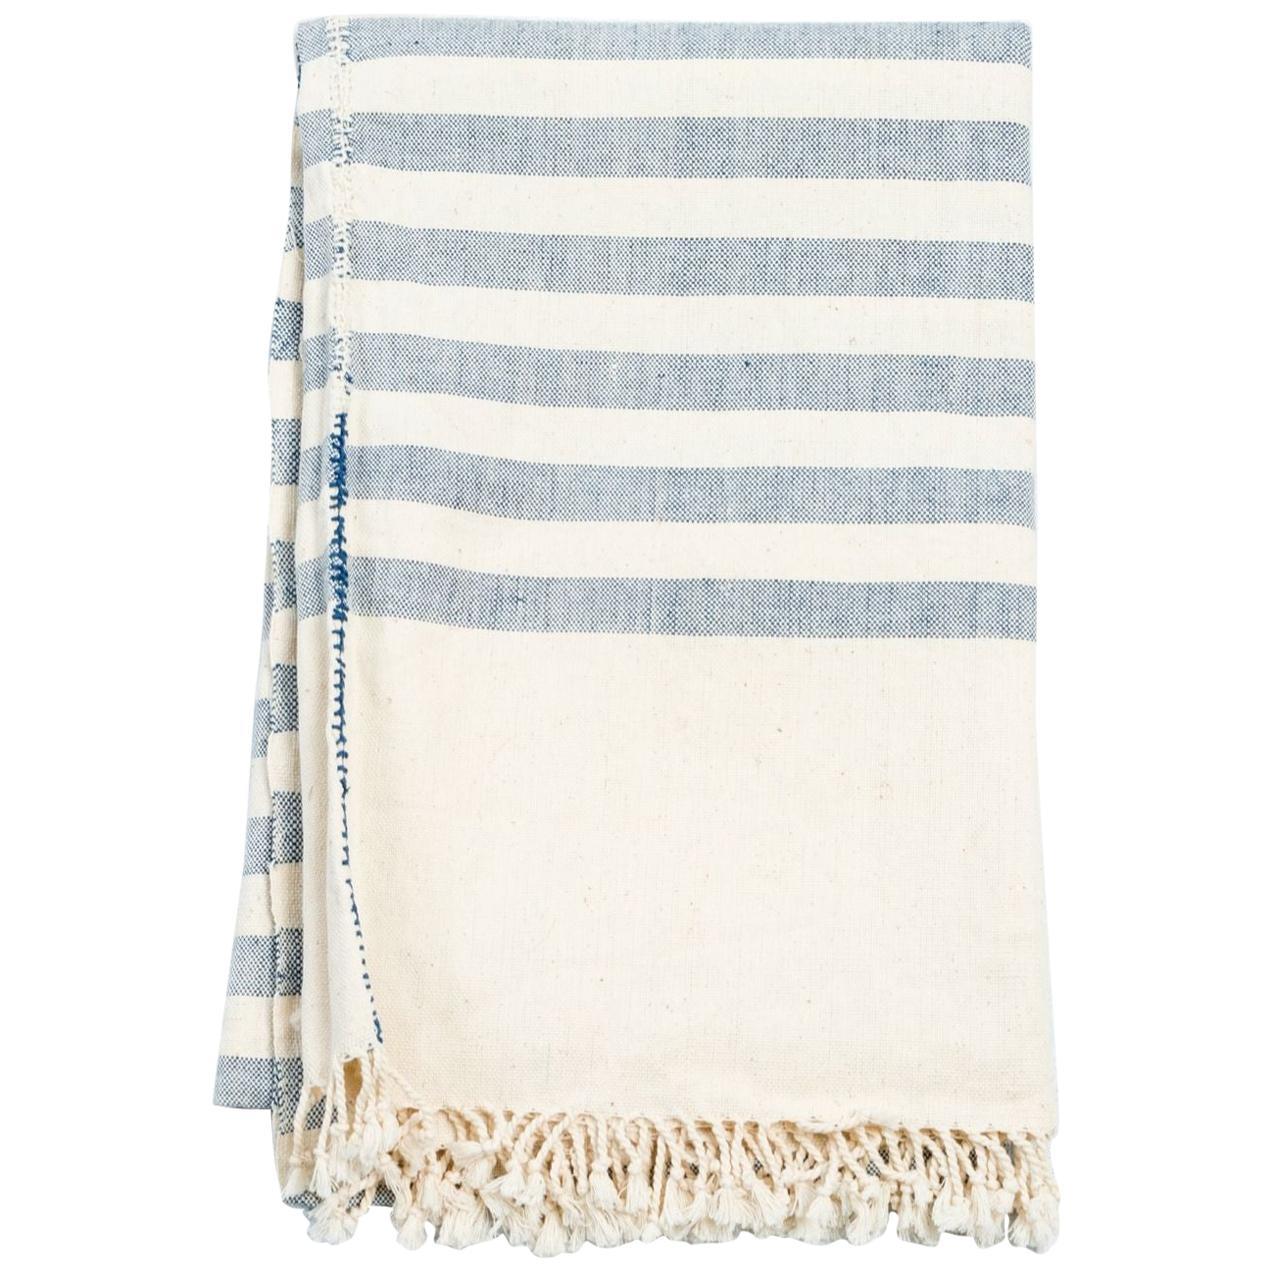 AARI Handloom Indigo Stripes Pattern Throw / Blanket in Organic Cotton